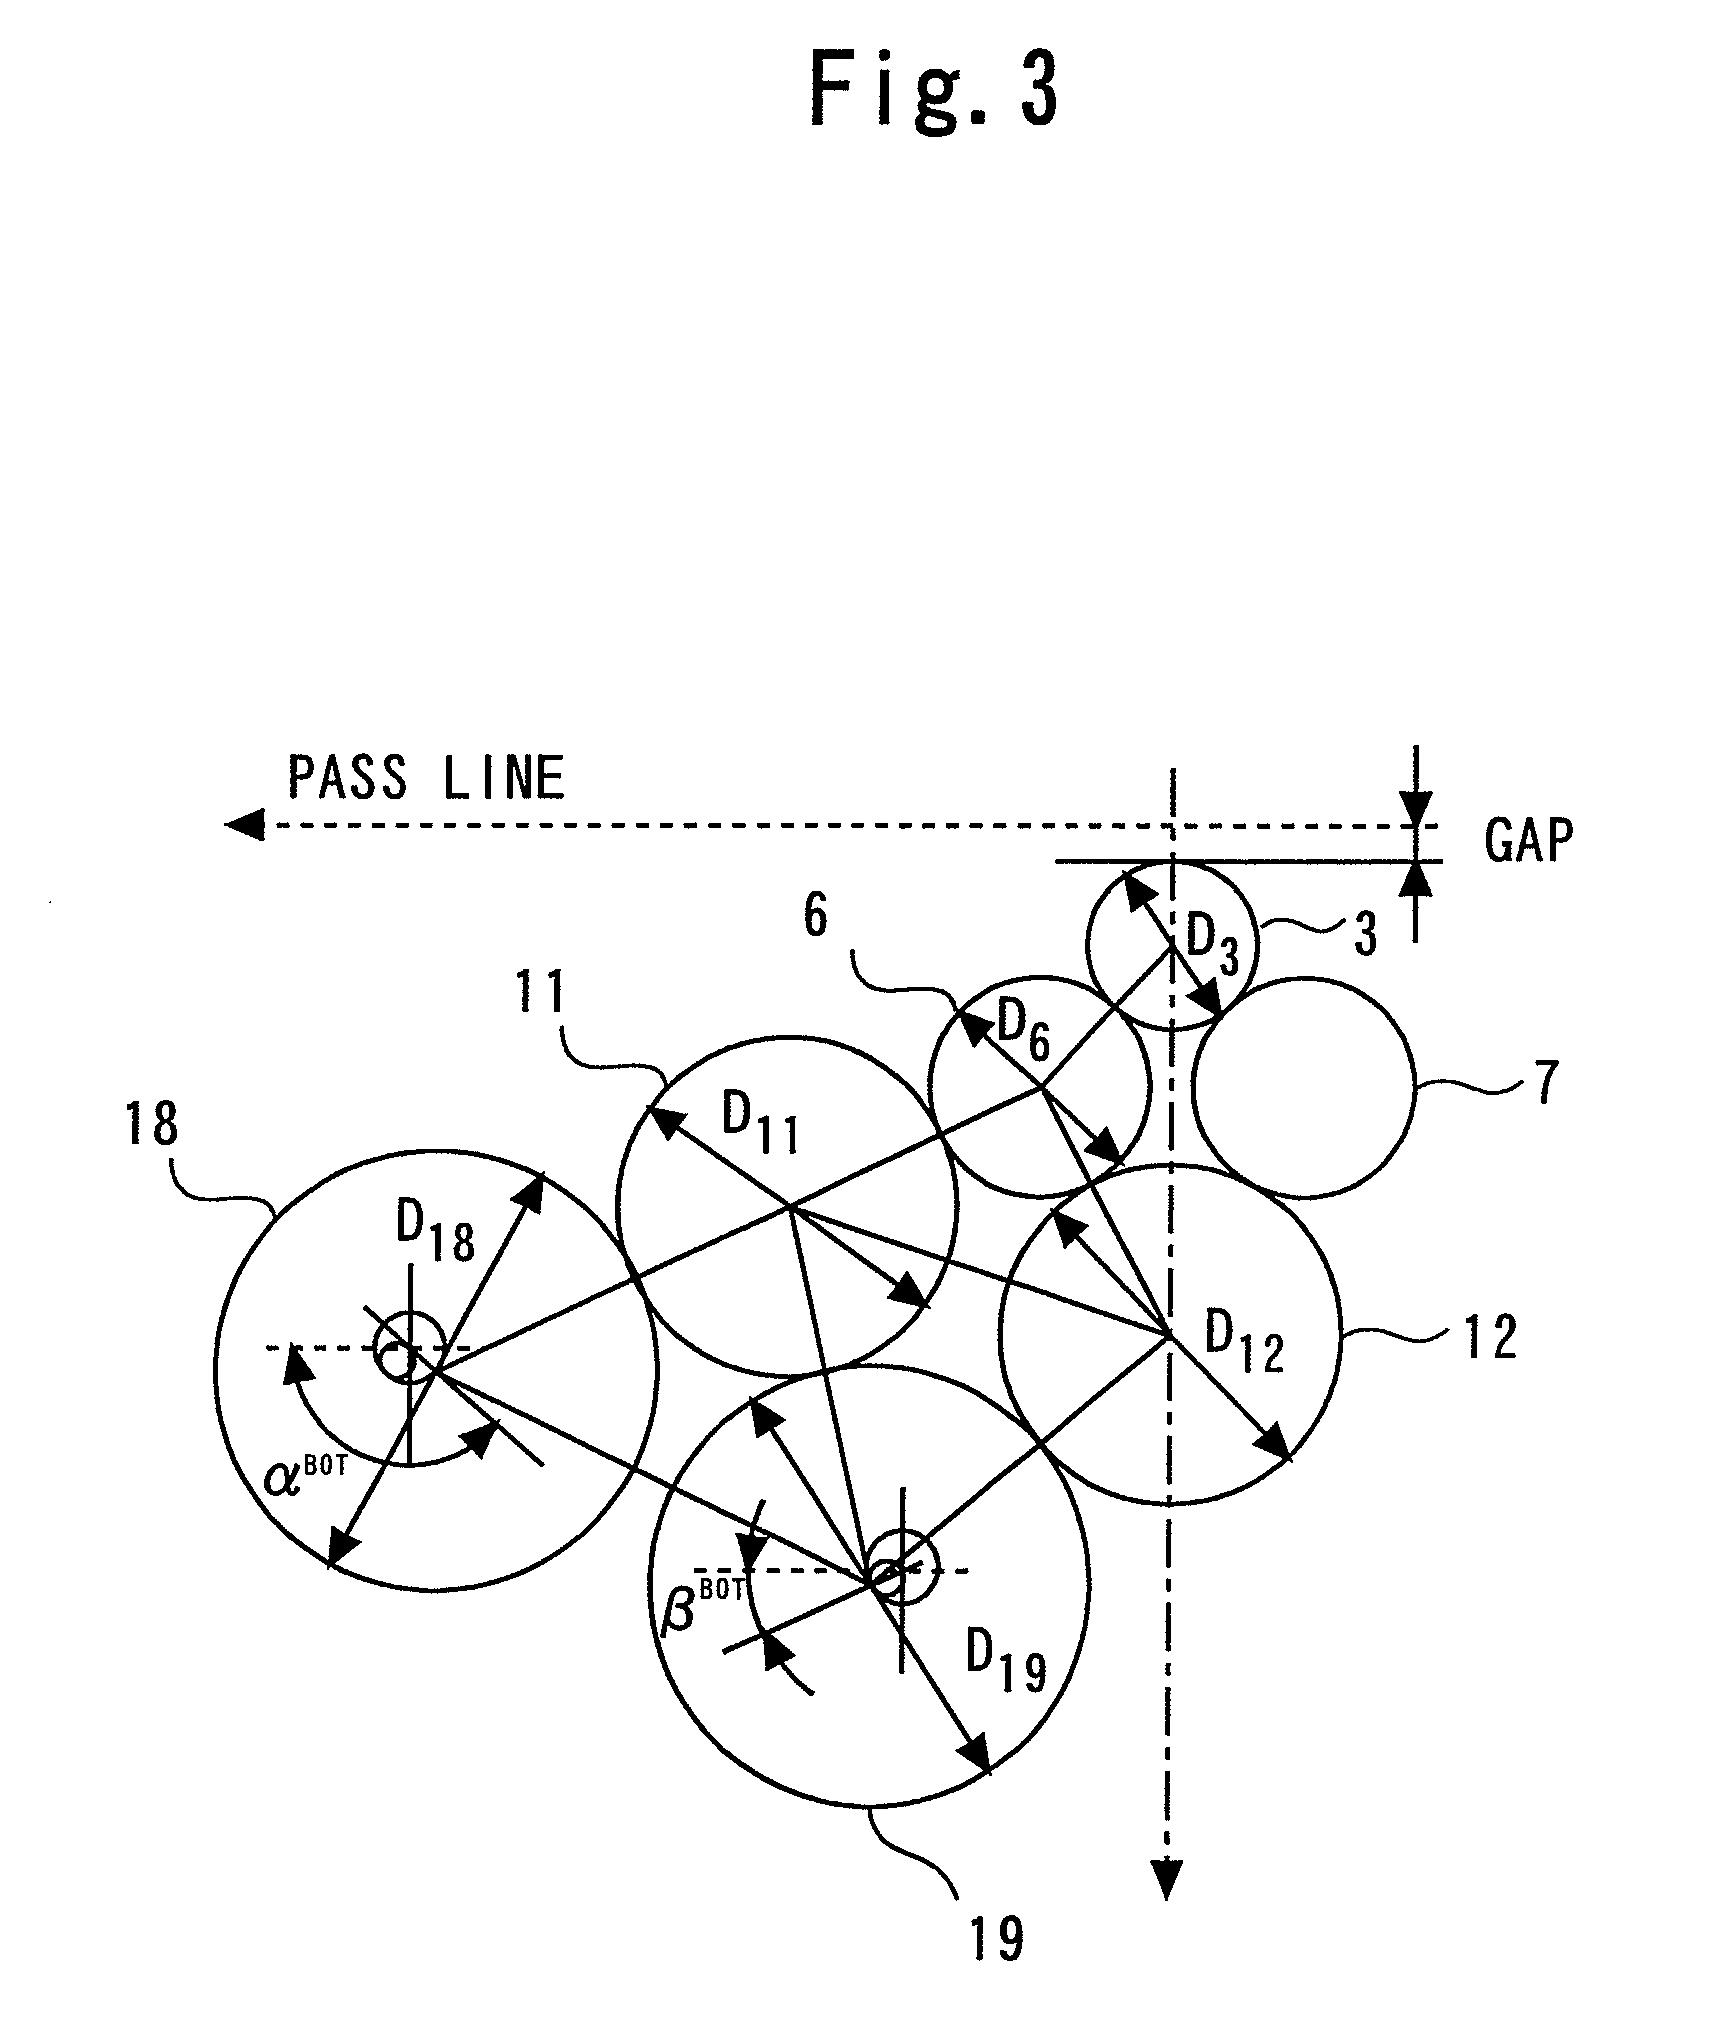 06 Pt Cruir Engine Diagram Th8000 Wiring Diagram